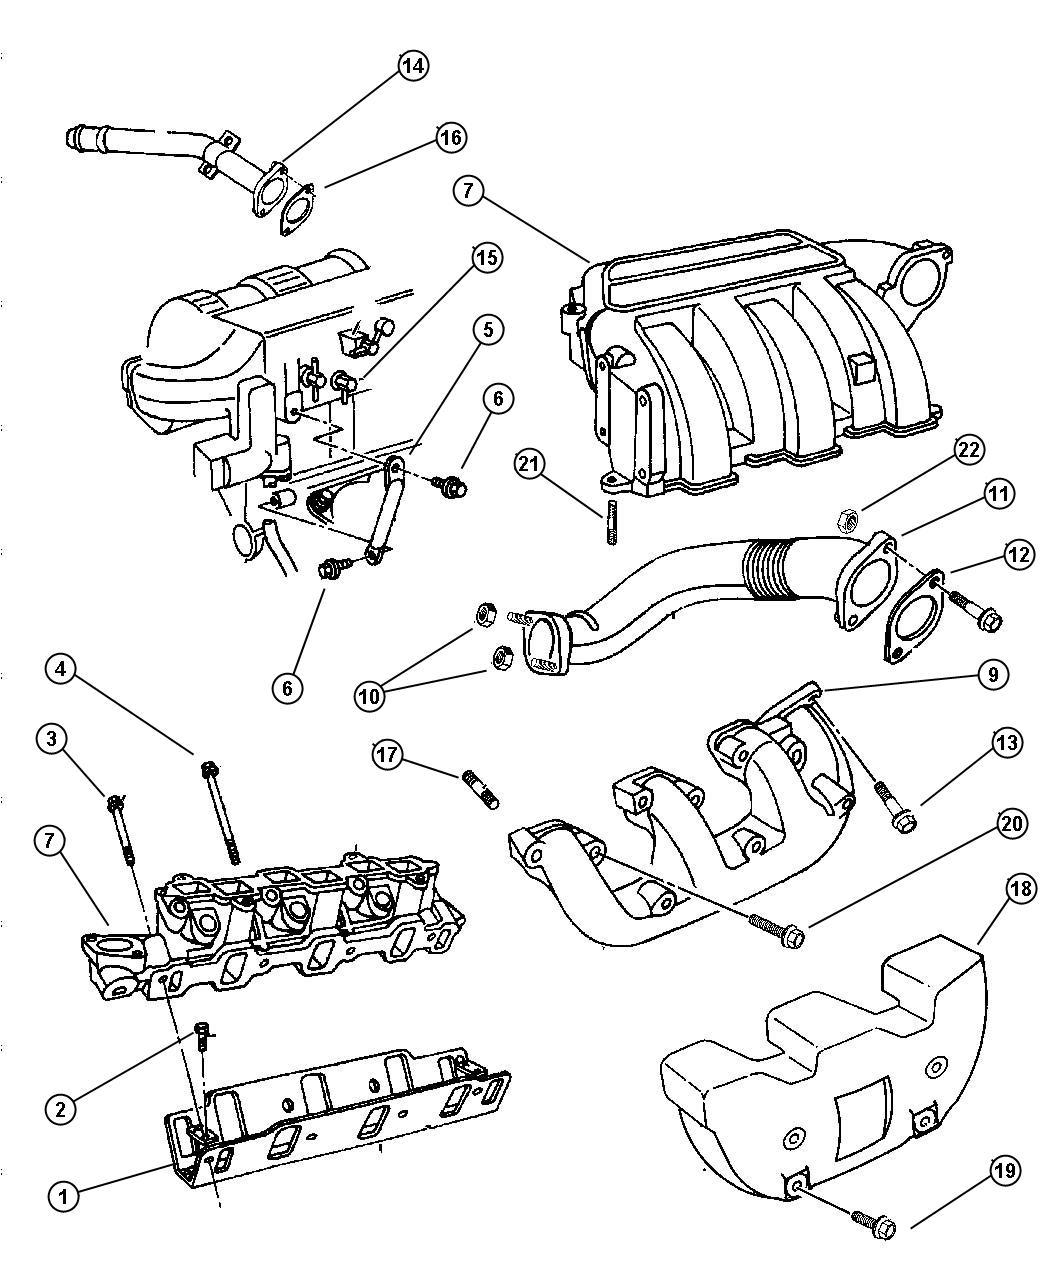 Manifolds Intake And Exhaust 3 3l Ega Egm Engine